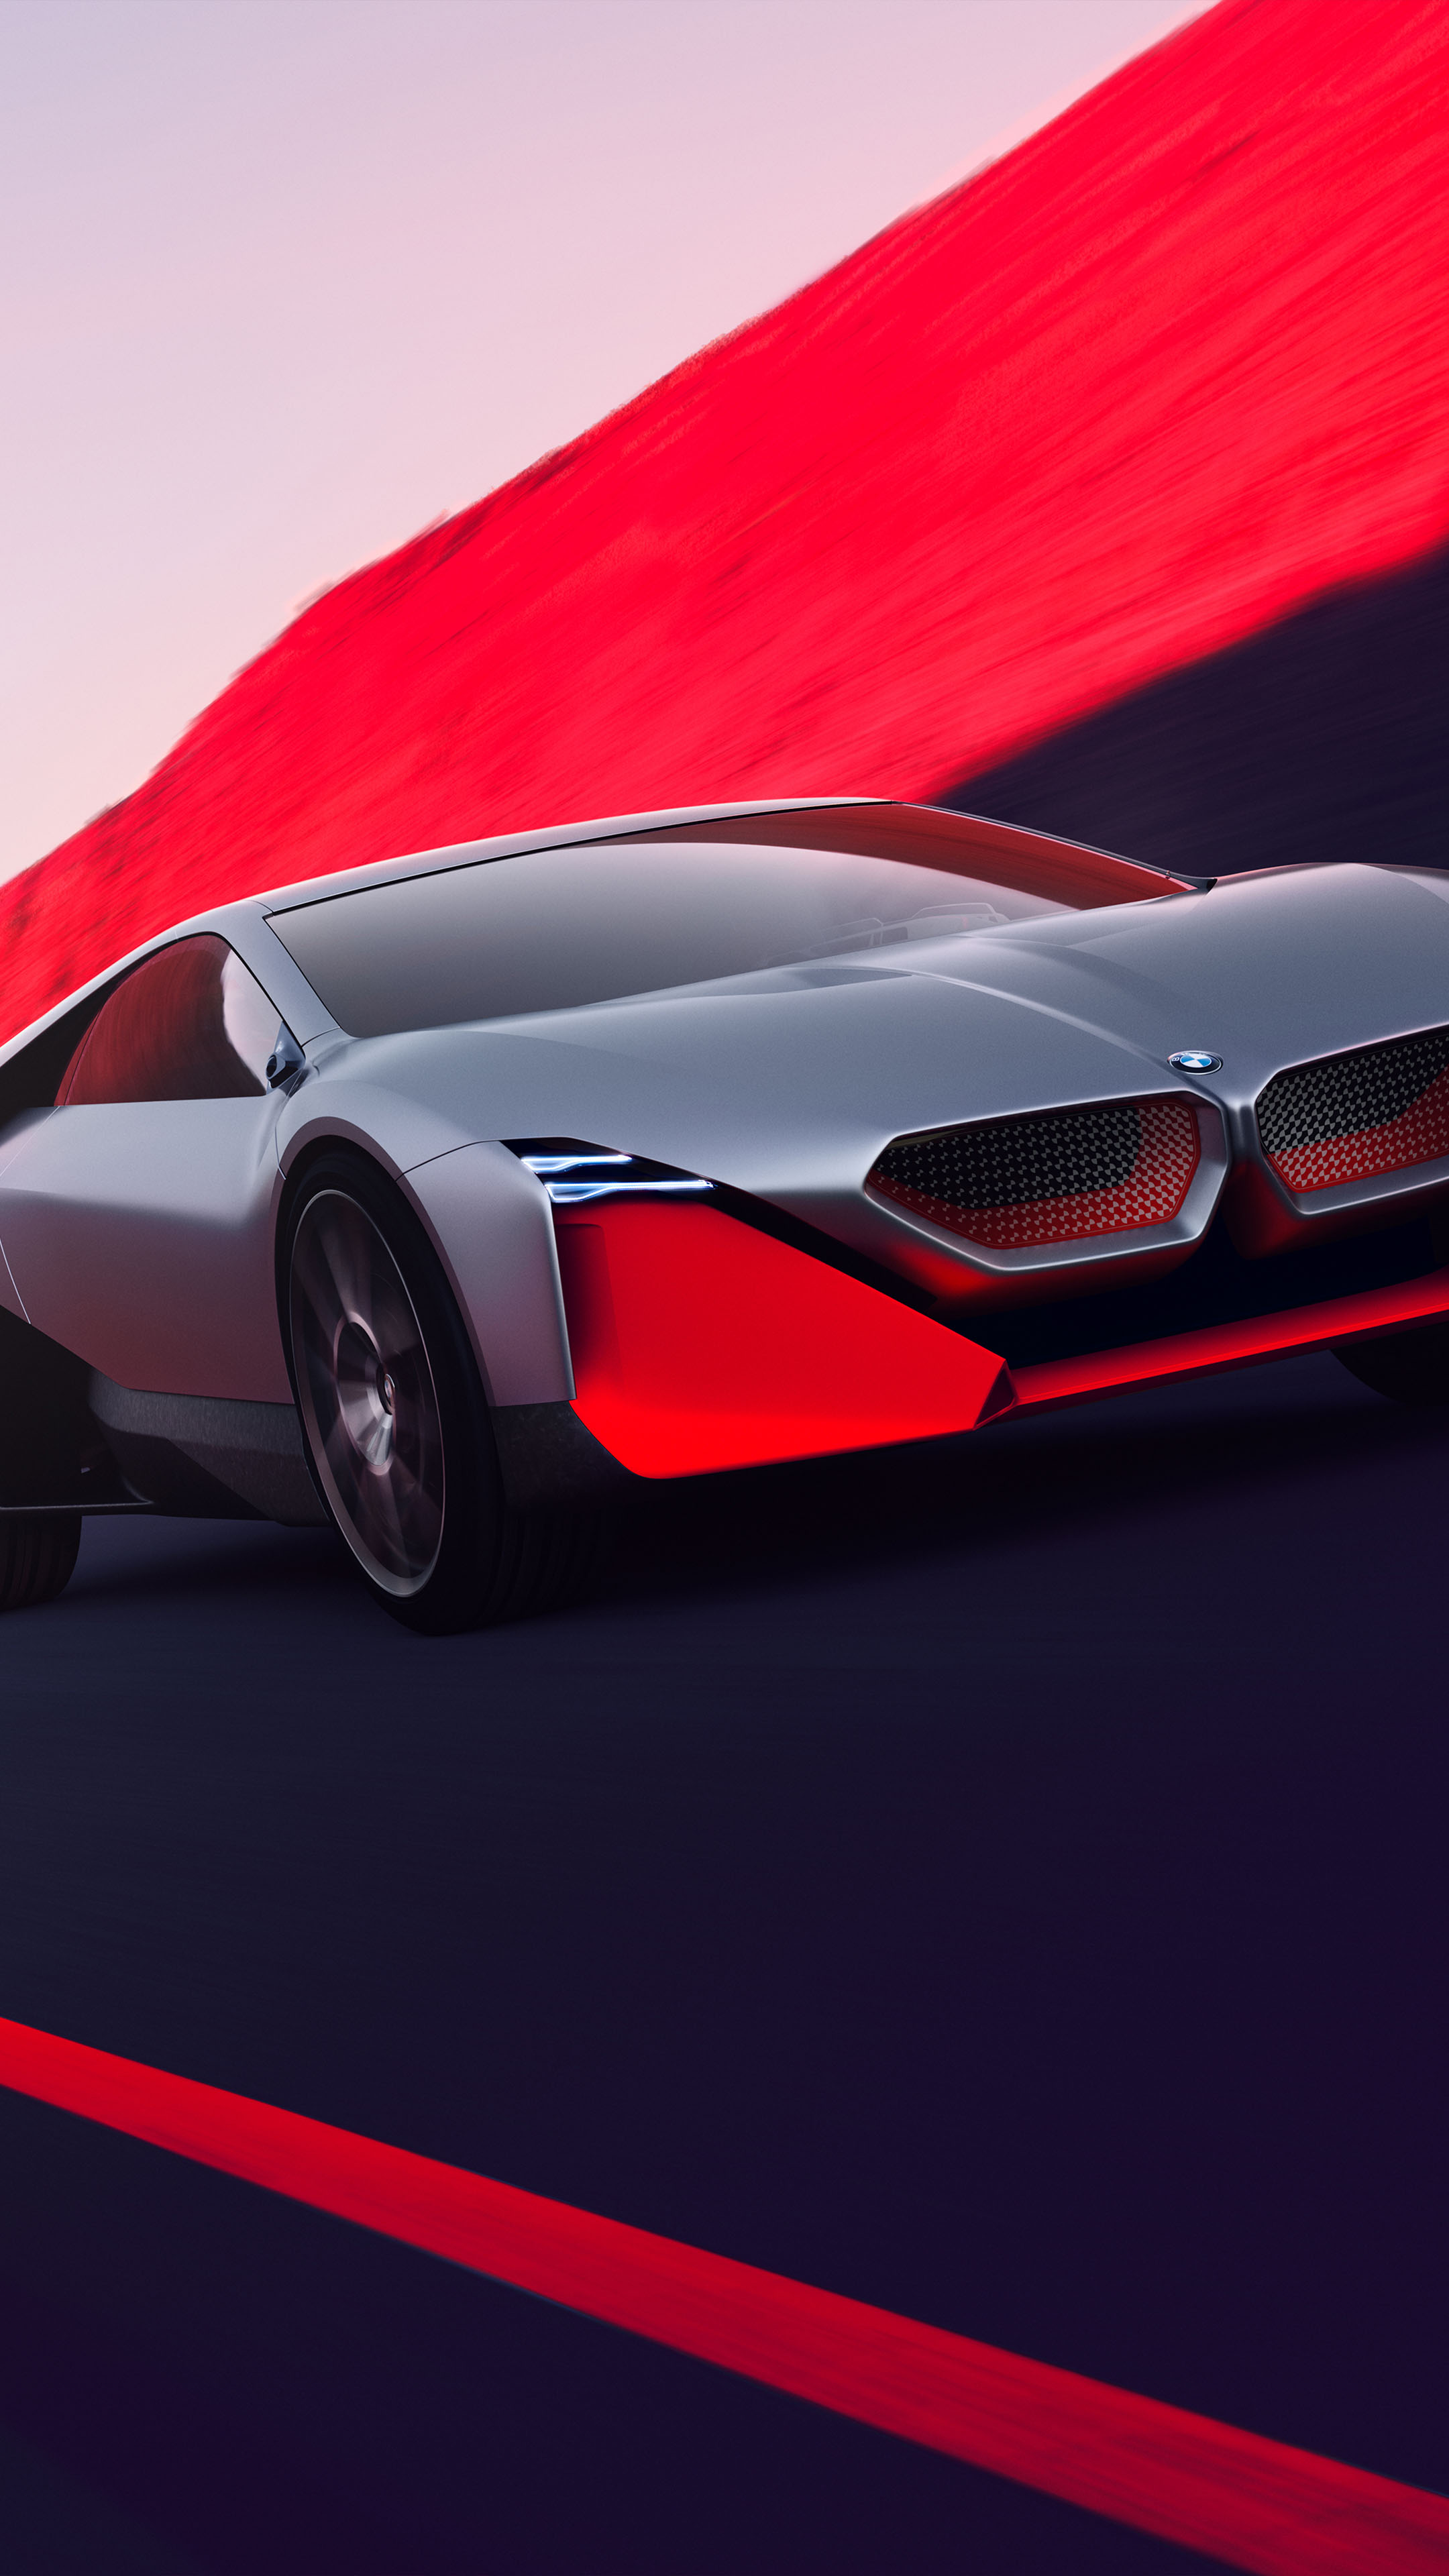 BMW Vision M-Next Concept Car Free 4K Ultra HD Mobile ...